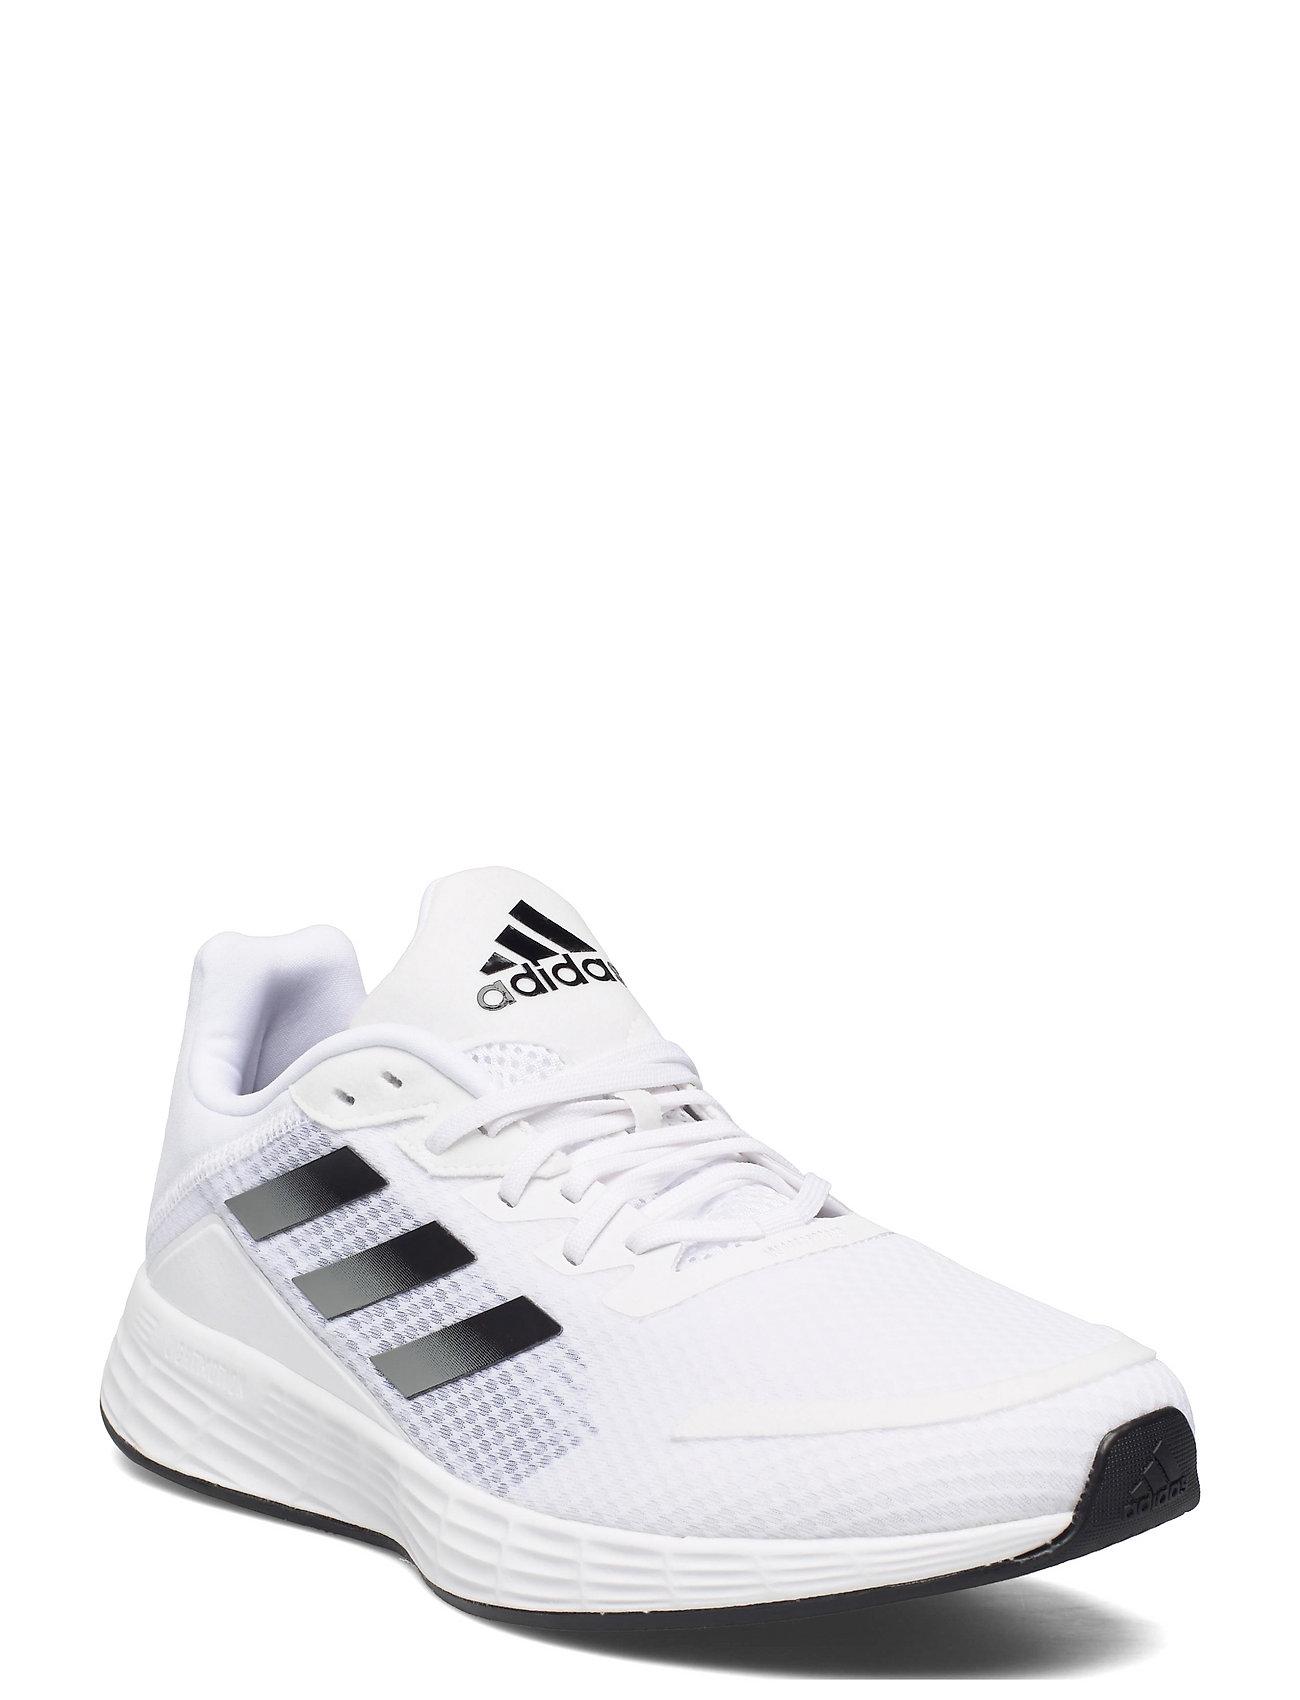 Duramo Sl Shoes Sport Shoes Running Shoes Hvid Adidas Performance